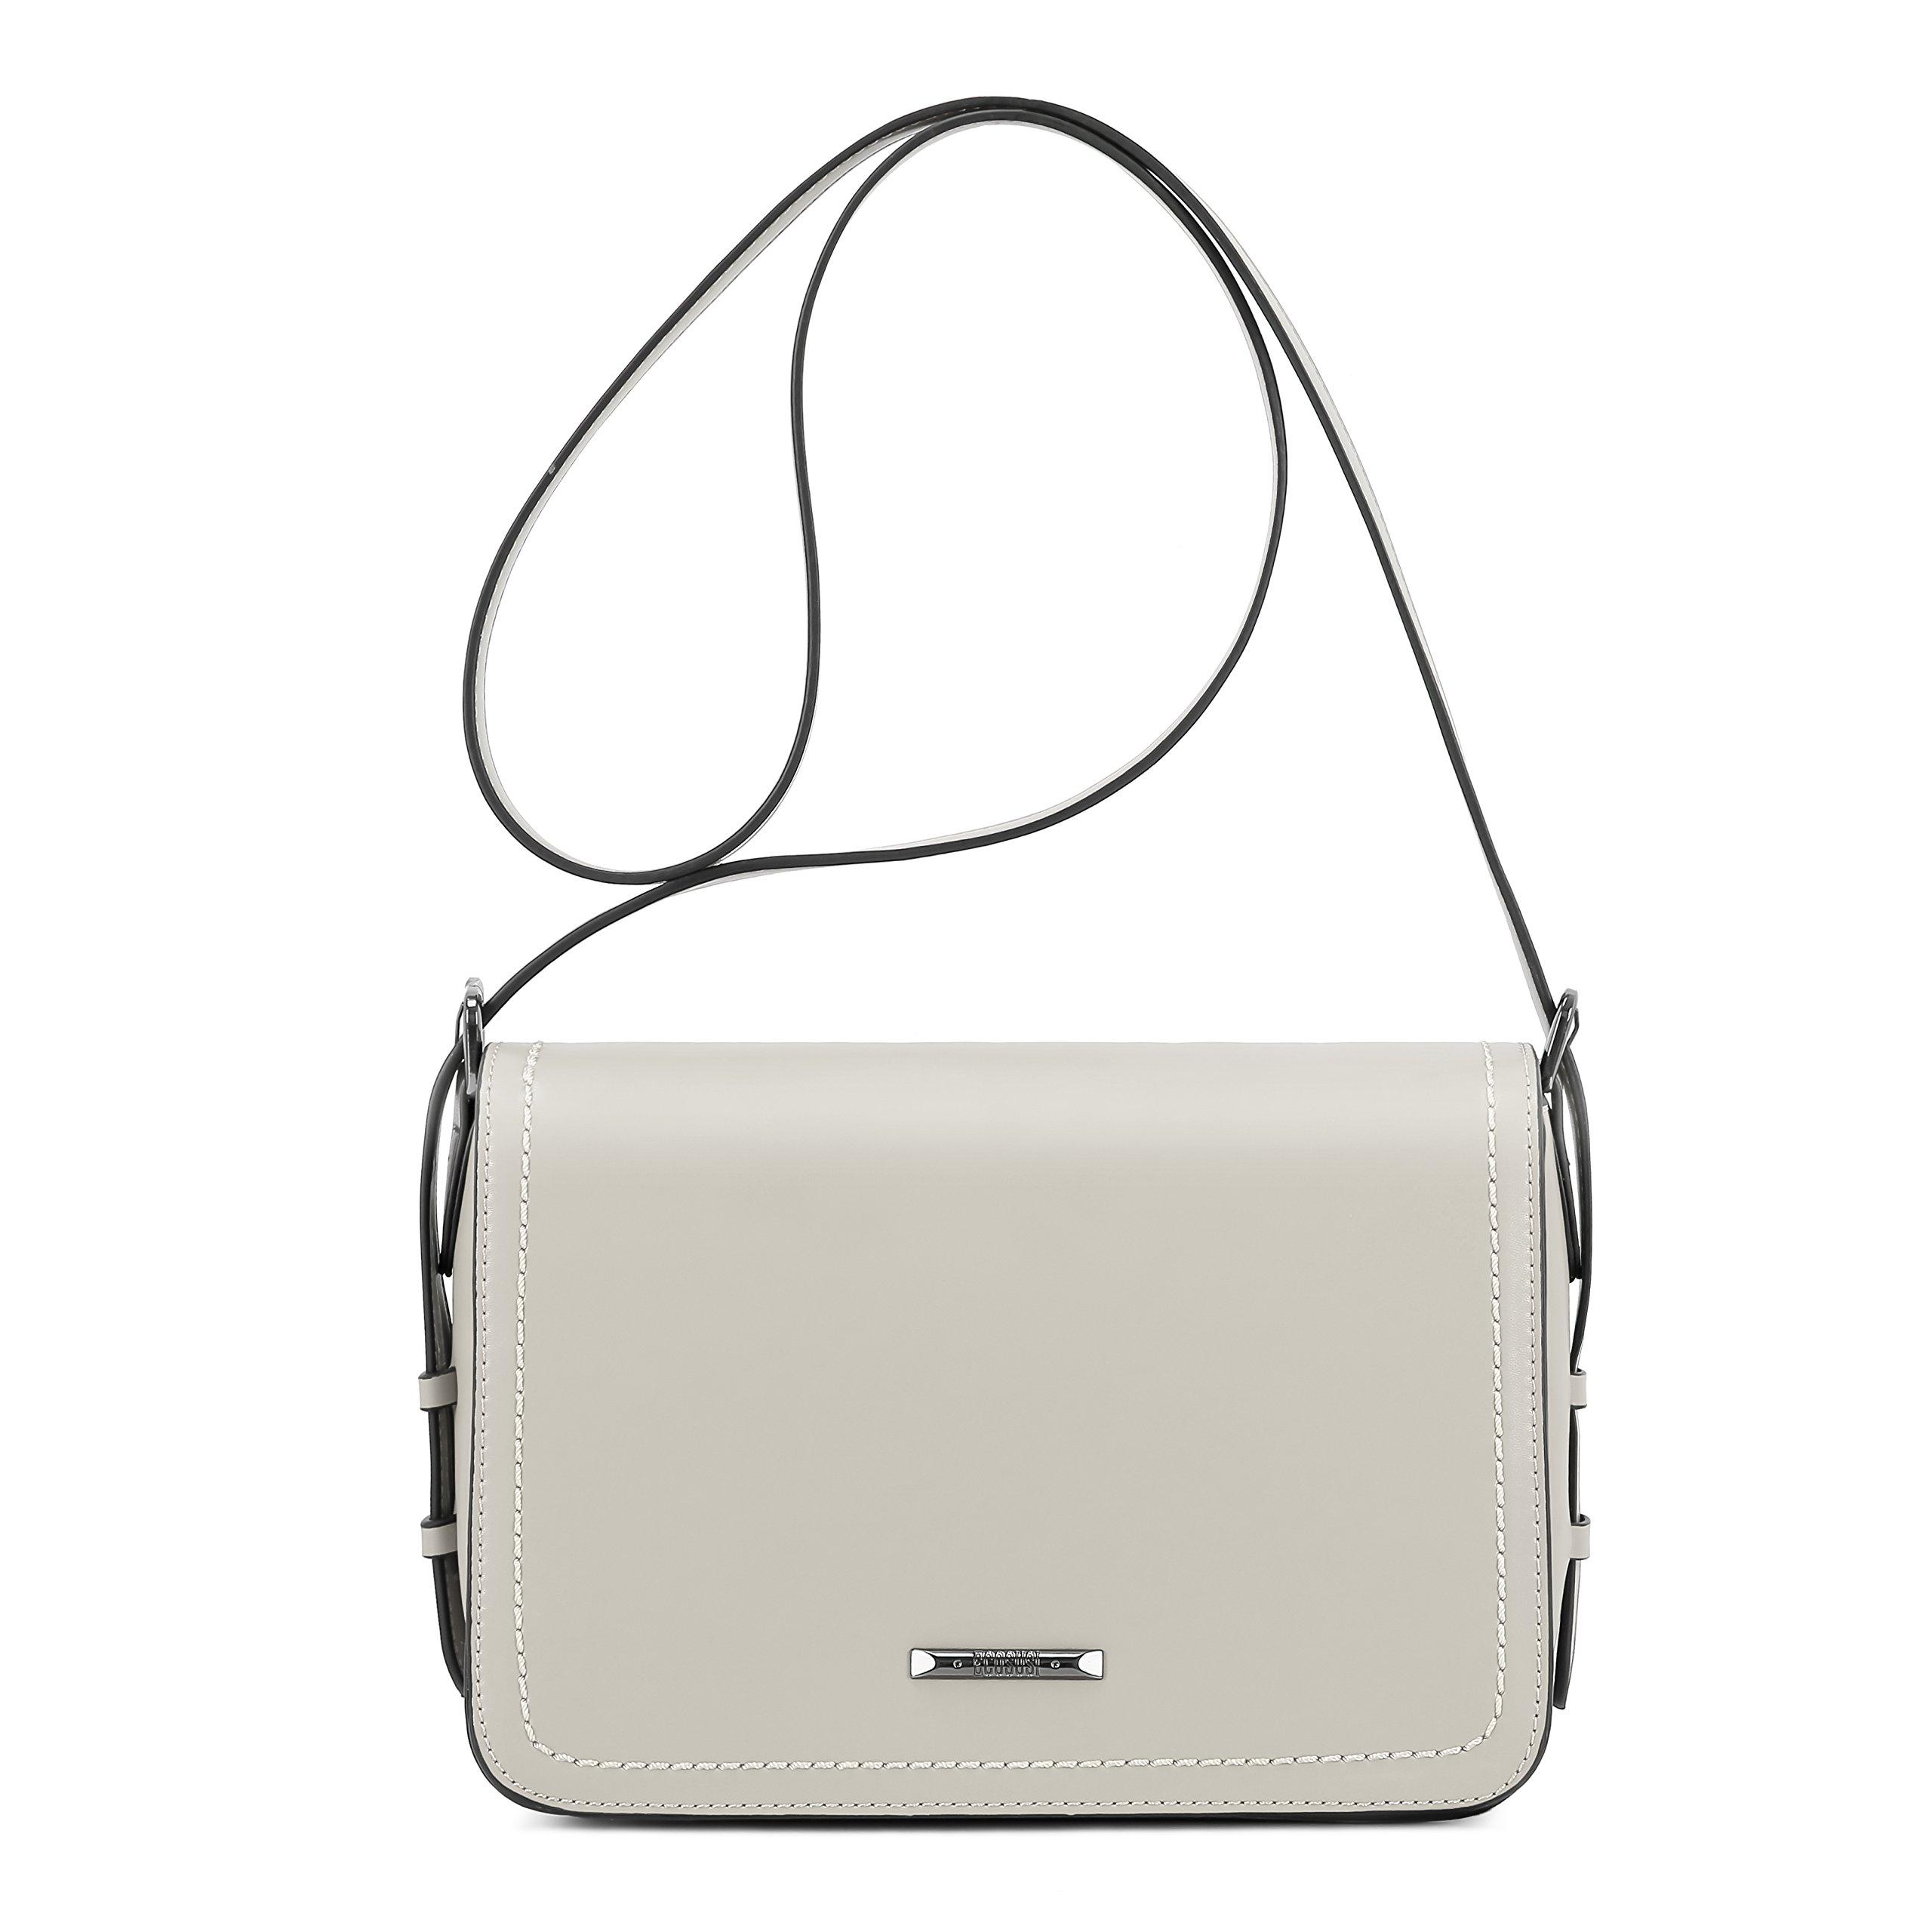 ECOSUSI Women's Crossbody Shoulder Bags Fashion FlapoverPurse with Adjustable Shoulder Strap, Grey